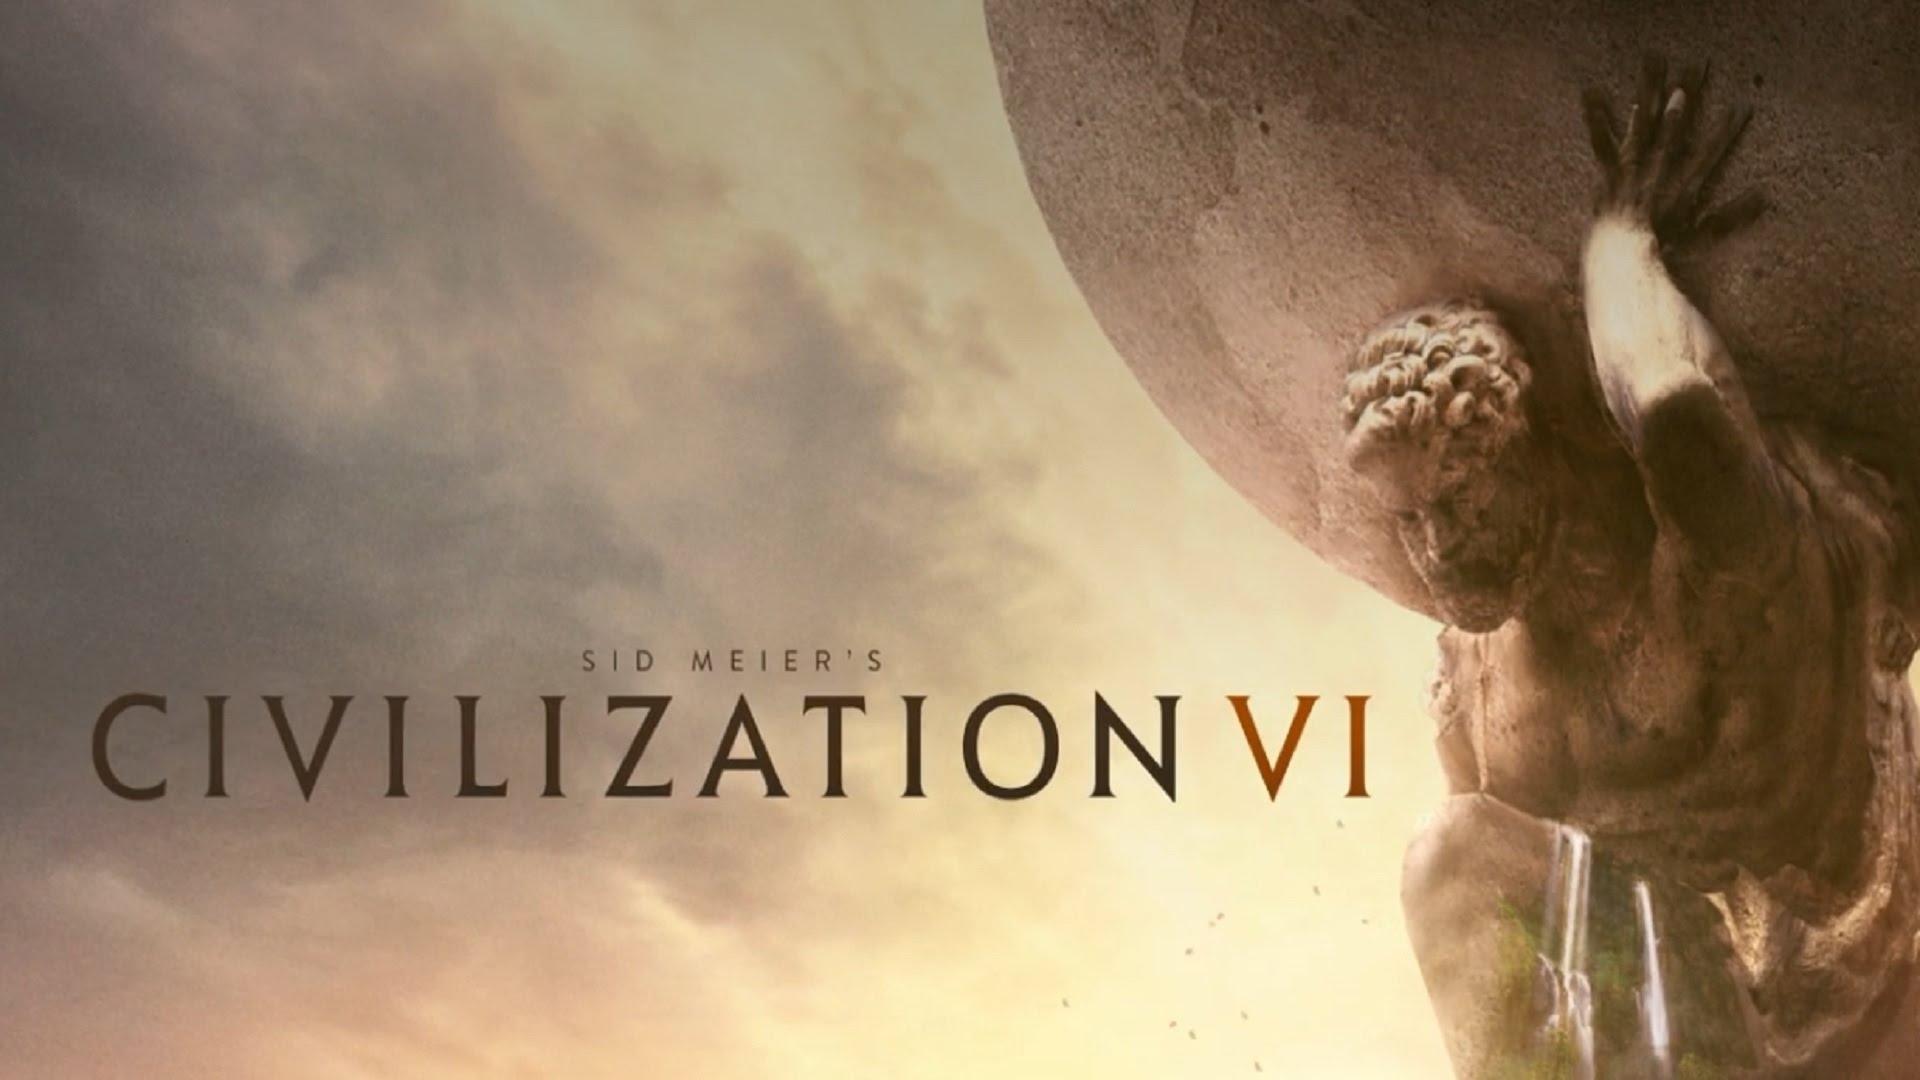 X Sid Meier's Civilization VI